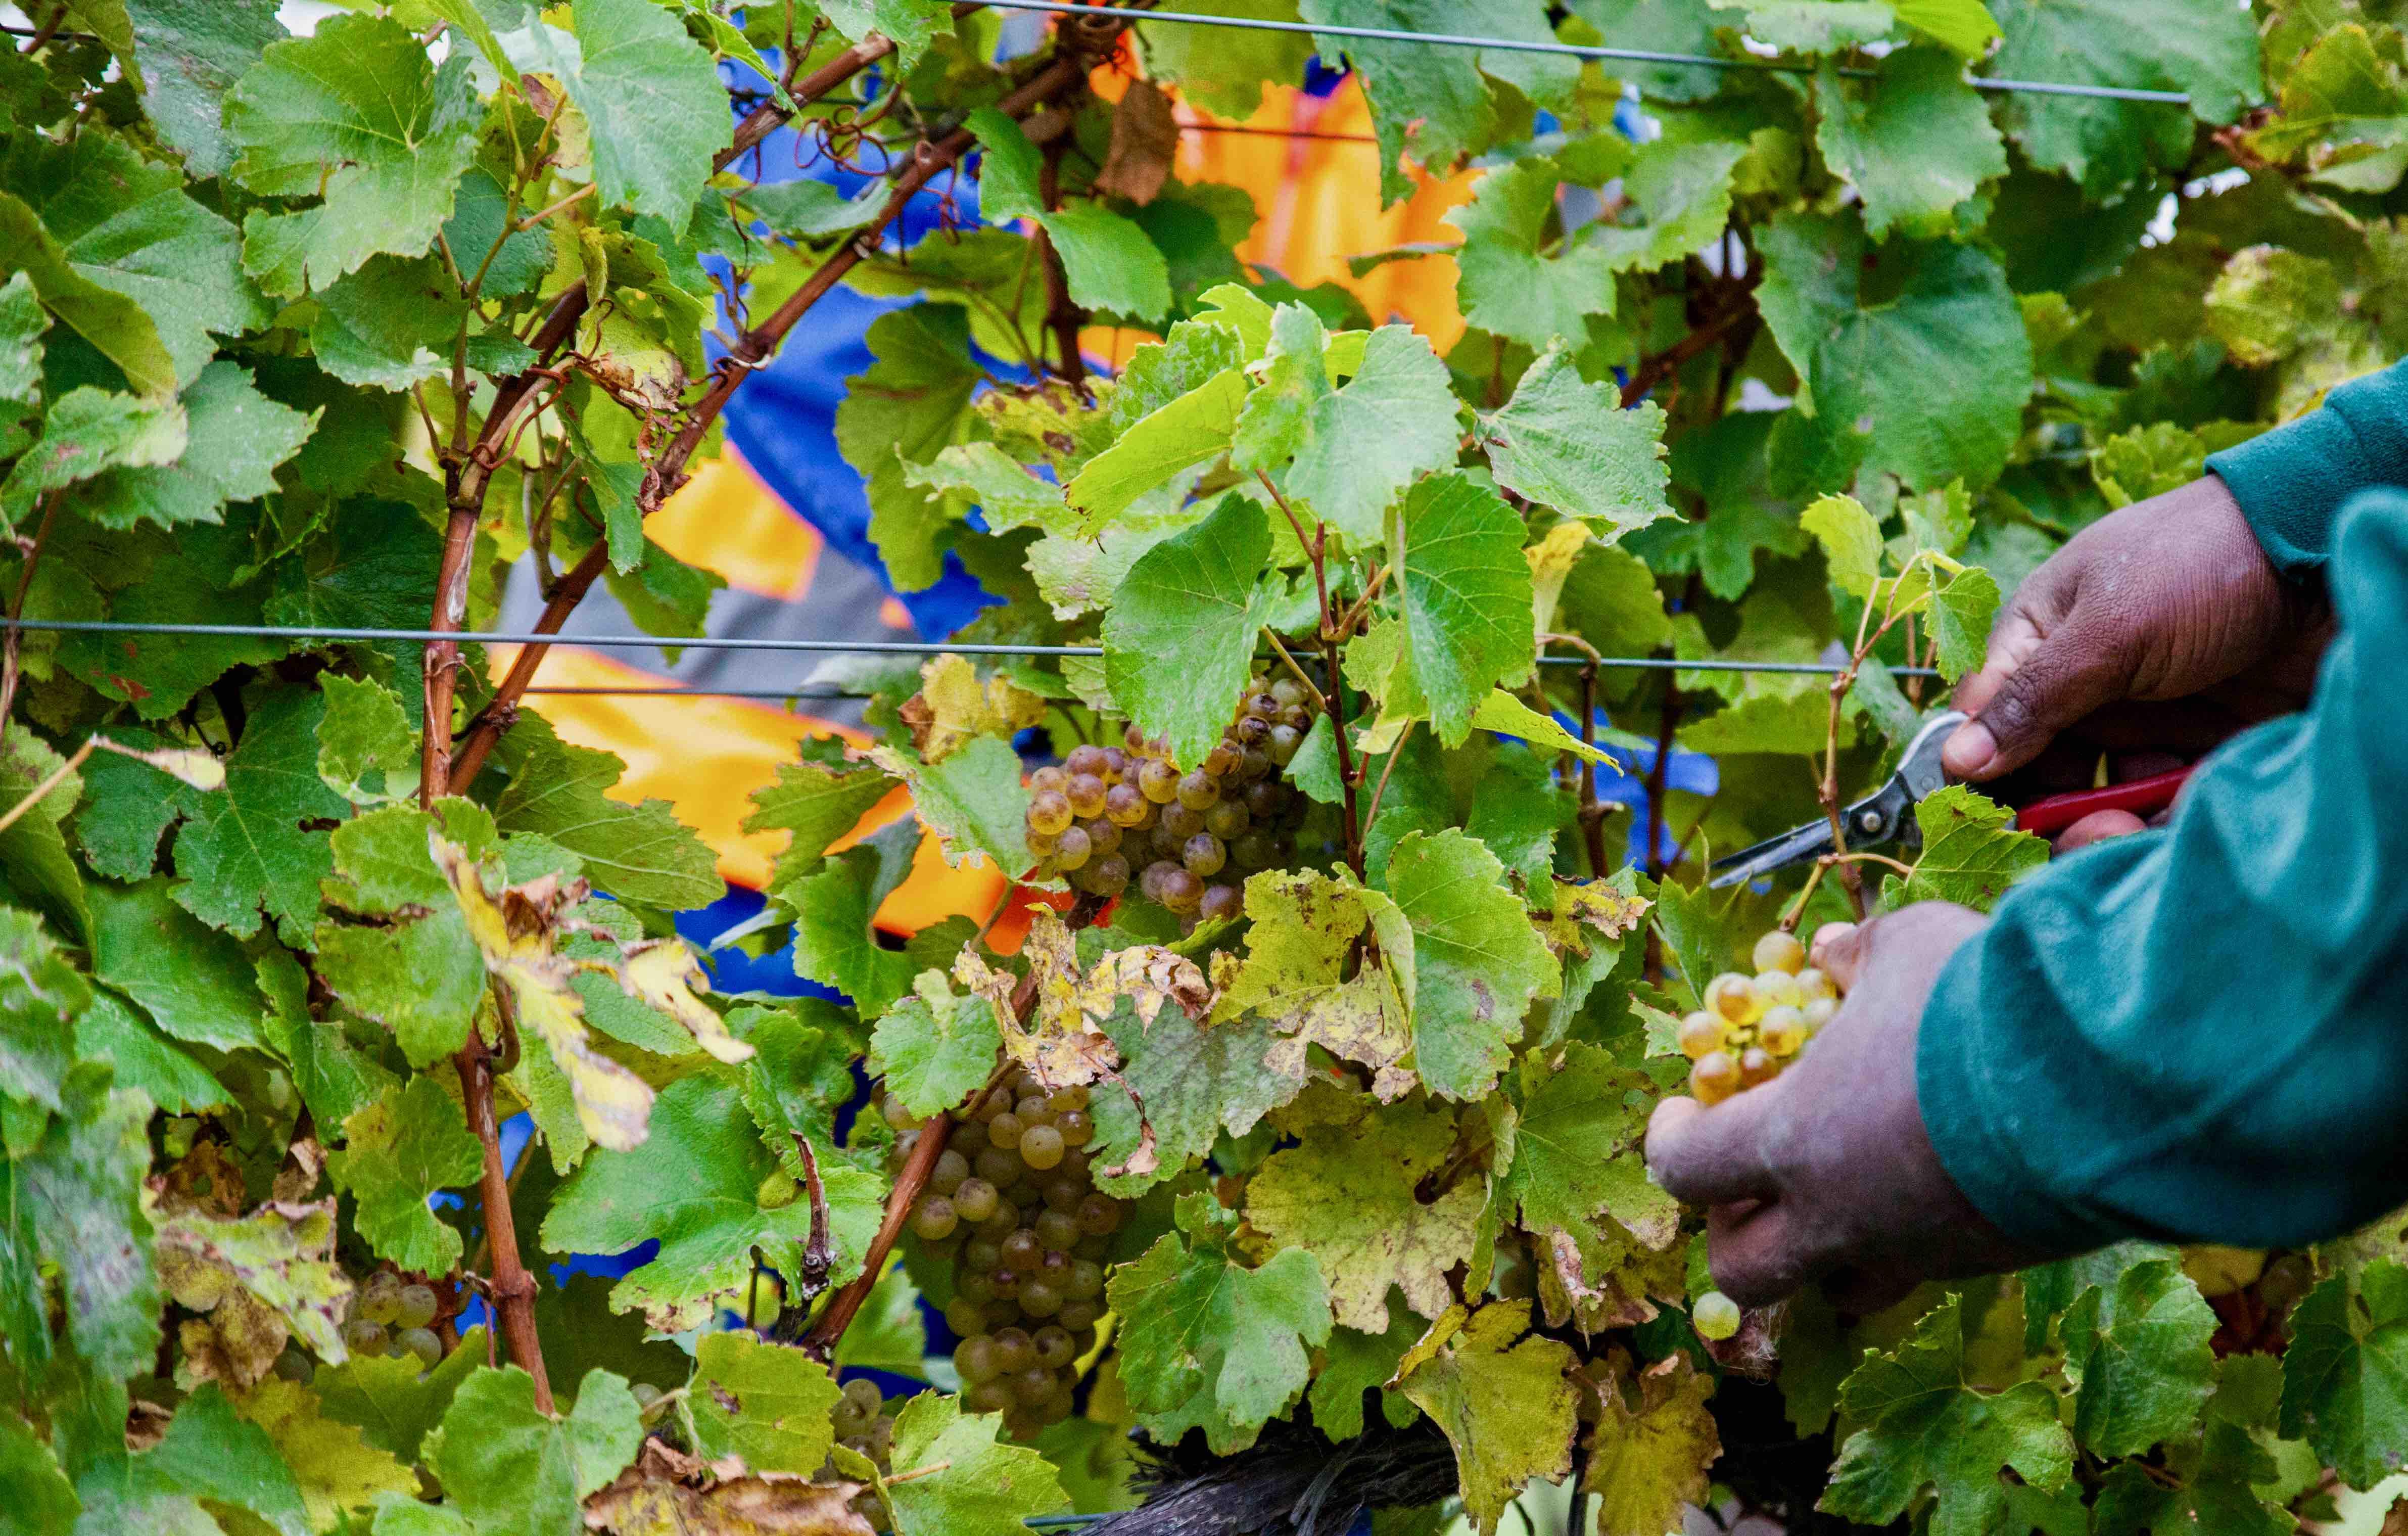 Foxes Island Chardonnay Harvest